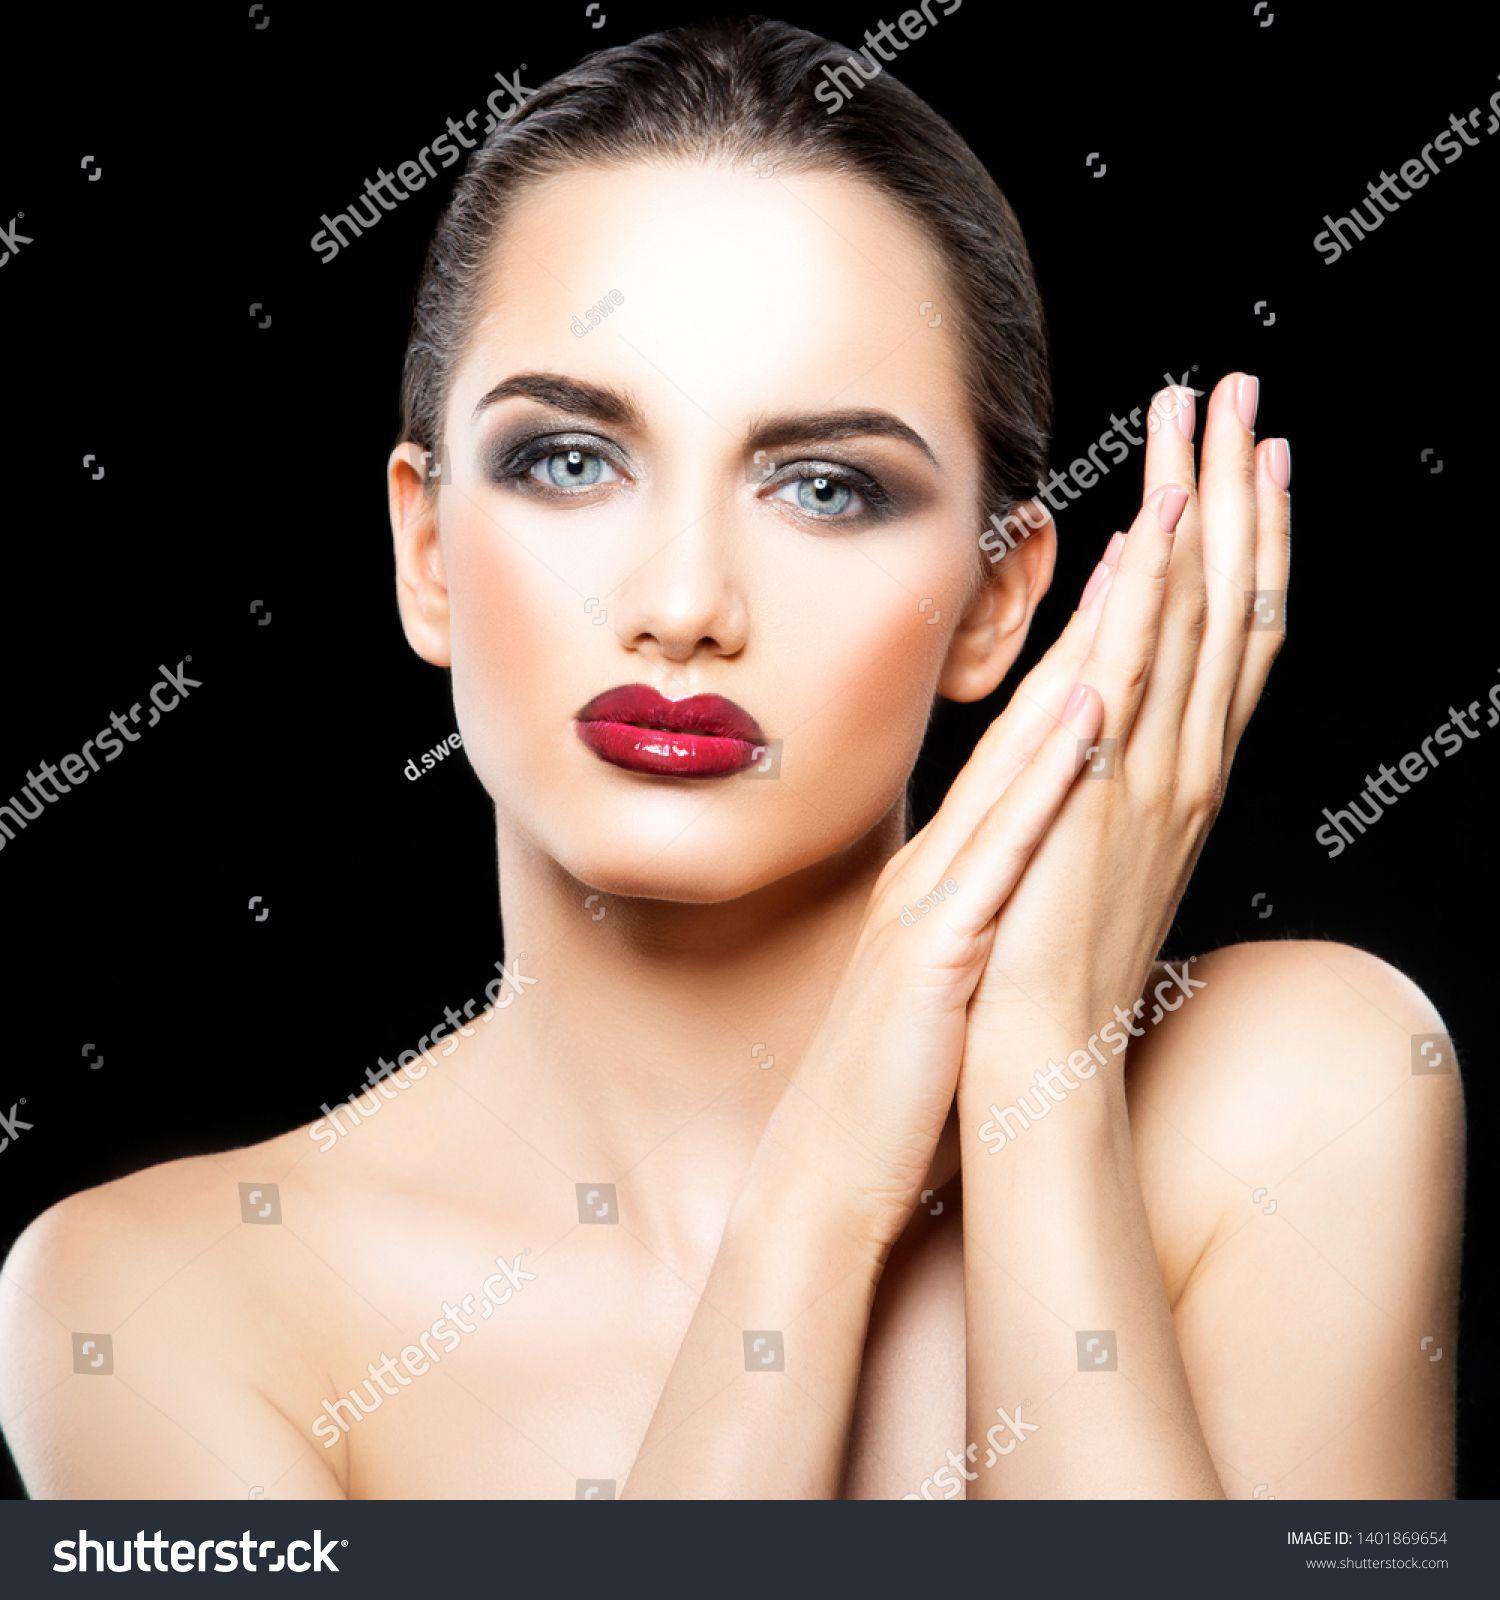 beauty young adult woman studio portrait, glossy